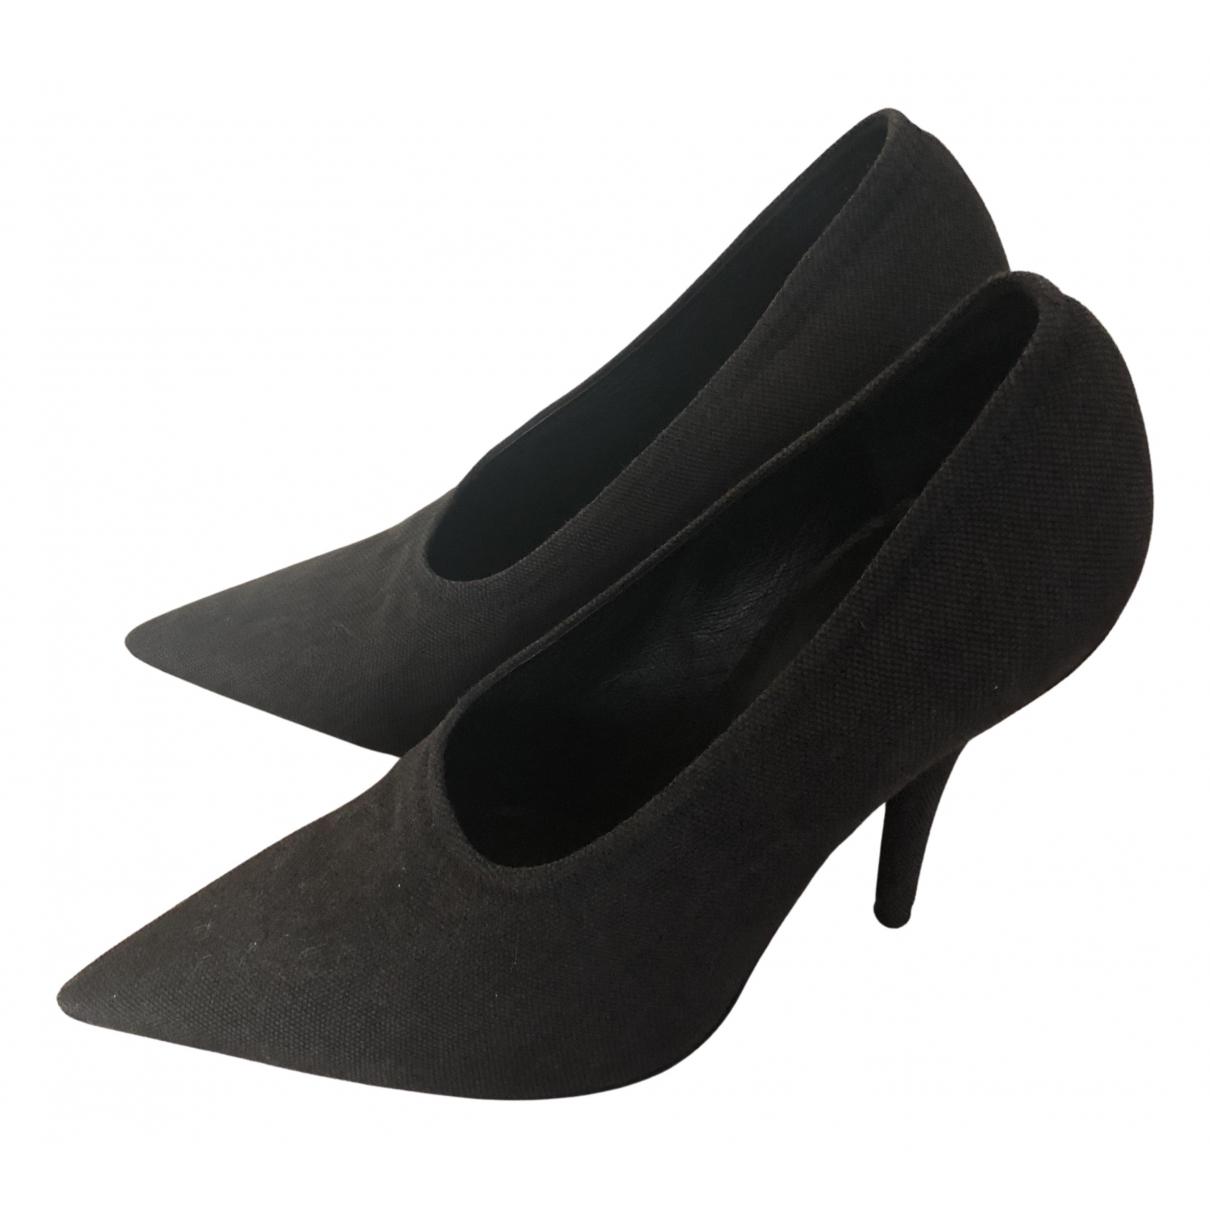 Yeezy N Grey Cloth Heels for Women 38 EU